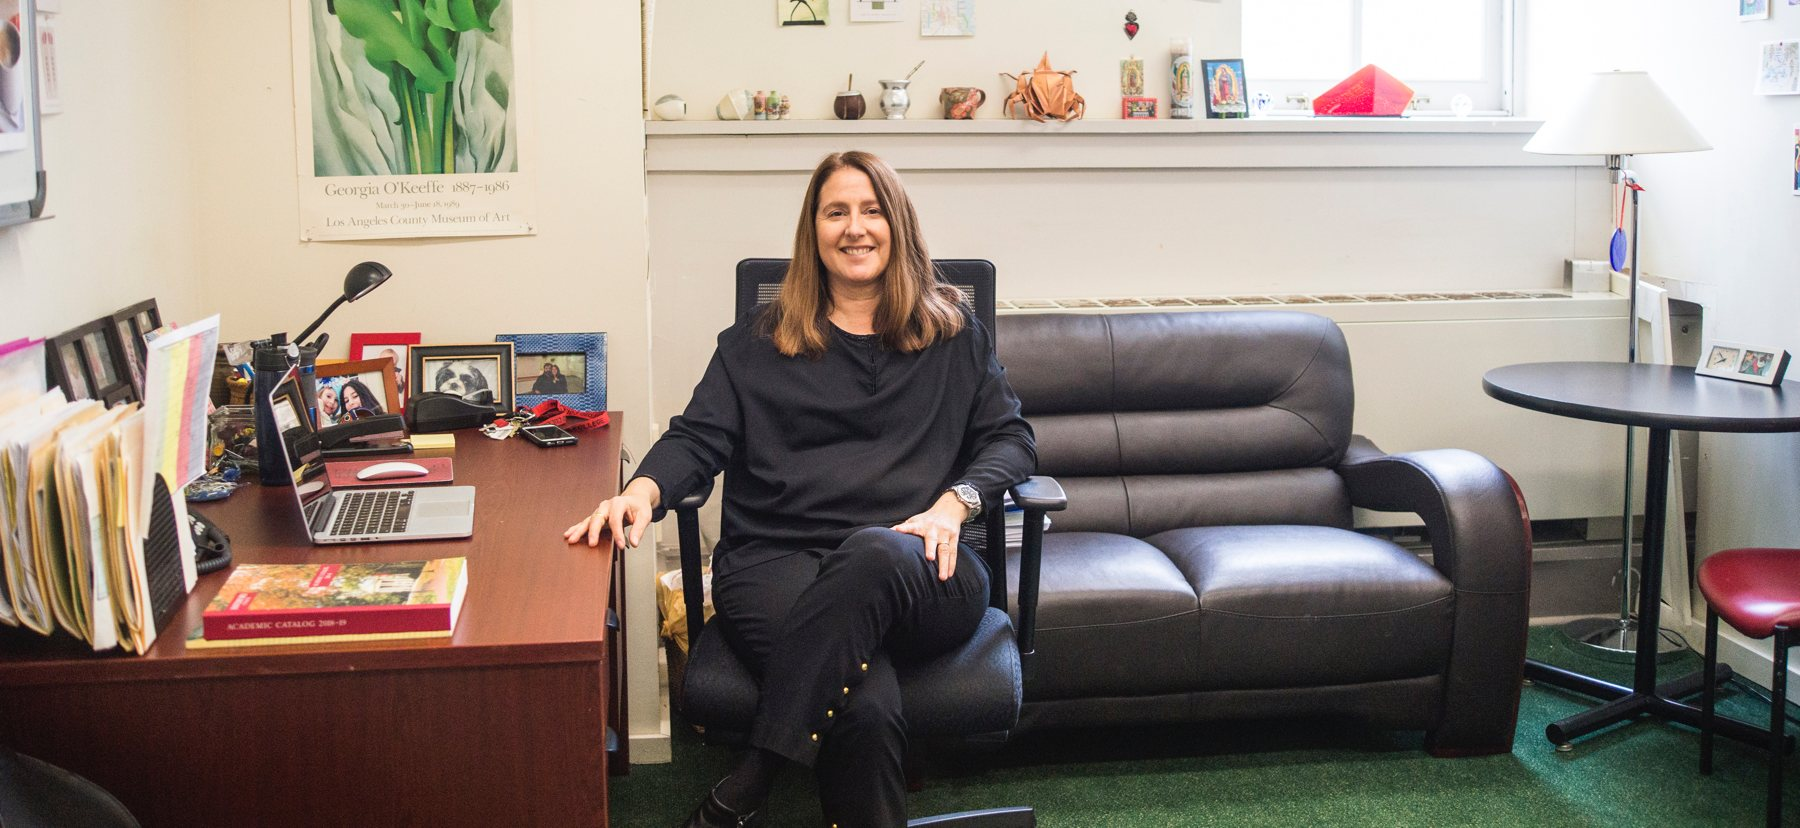 A woman sits at a desk